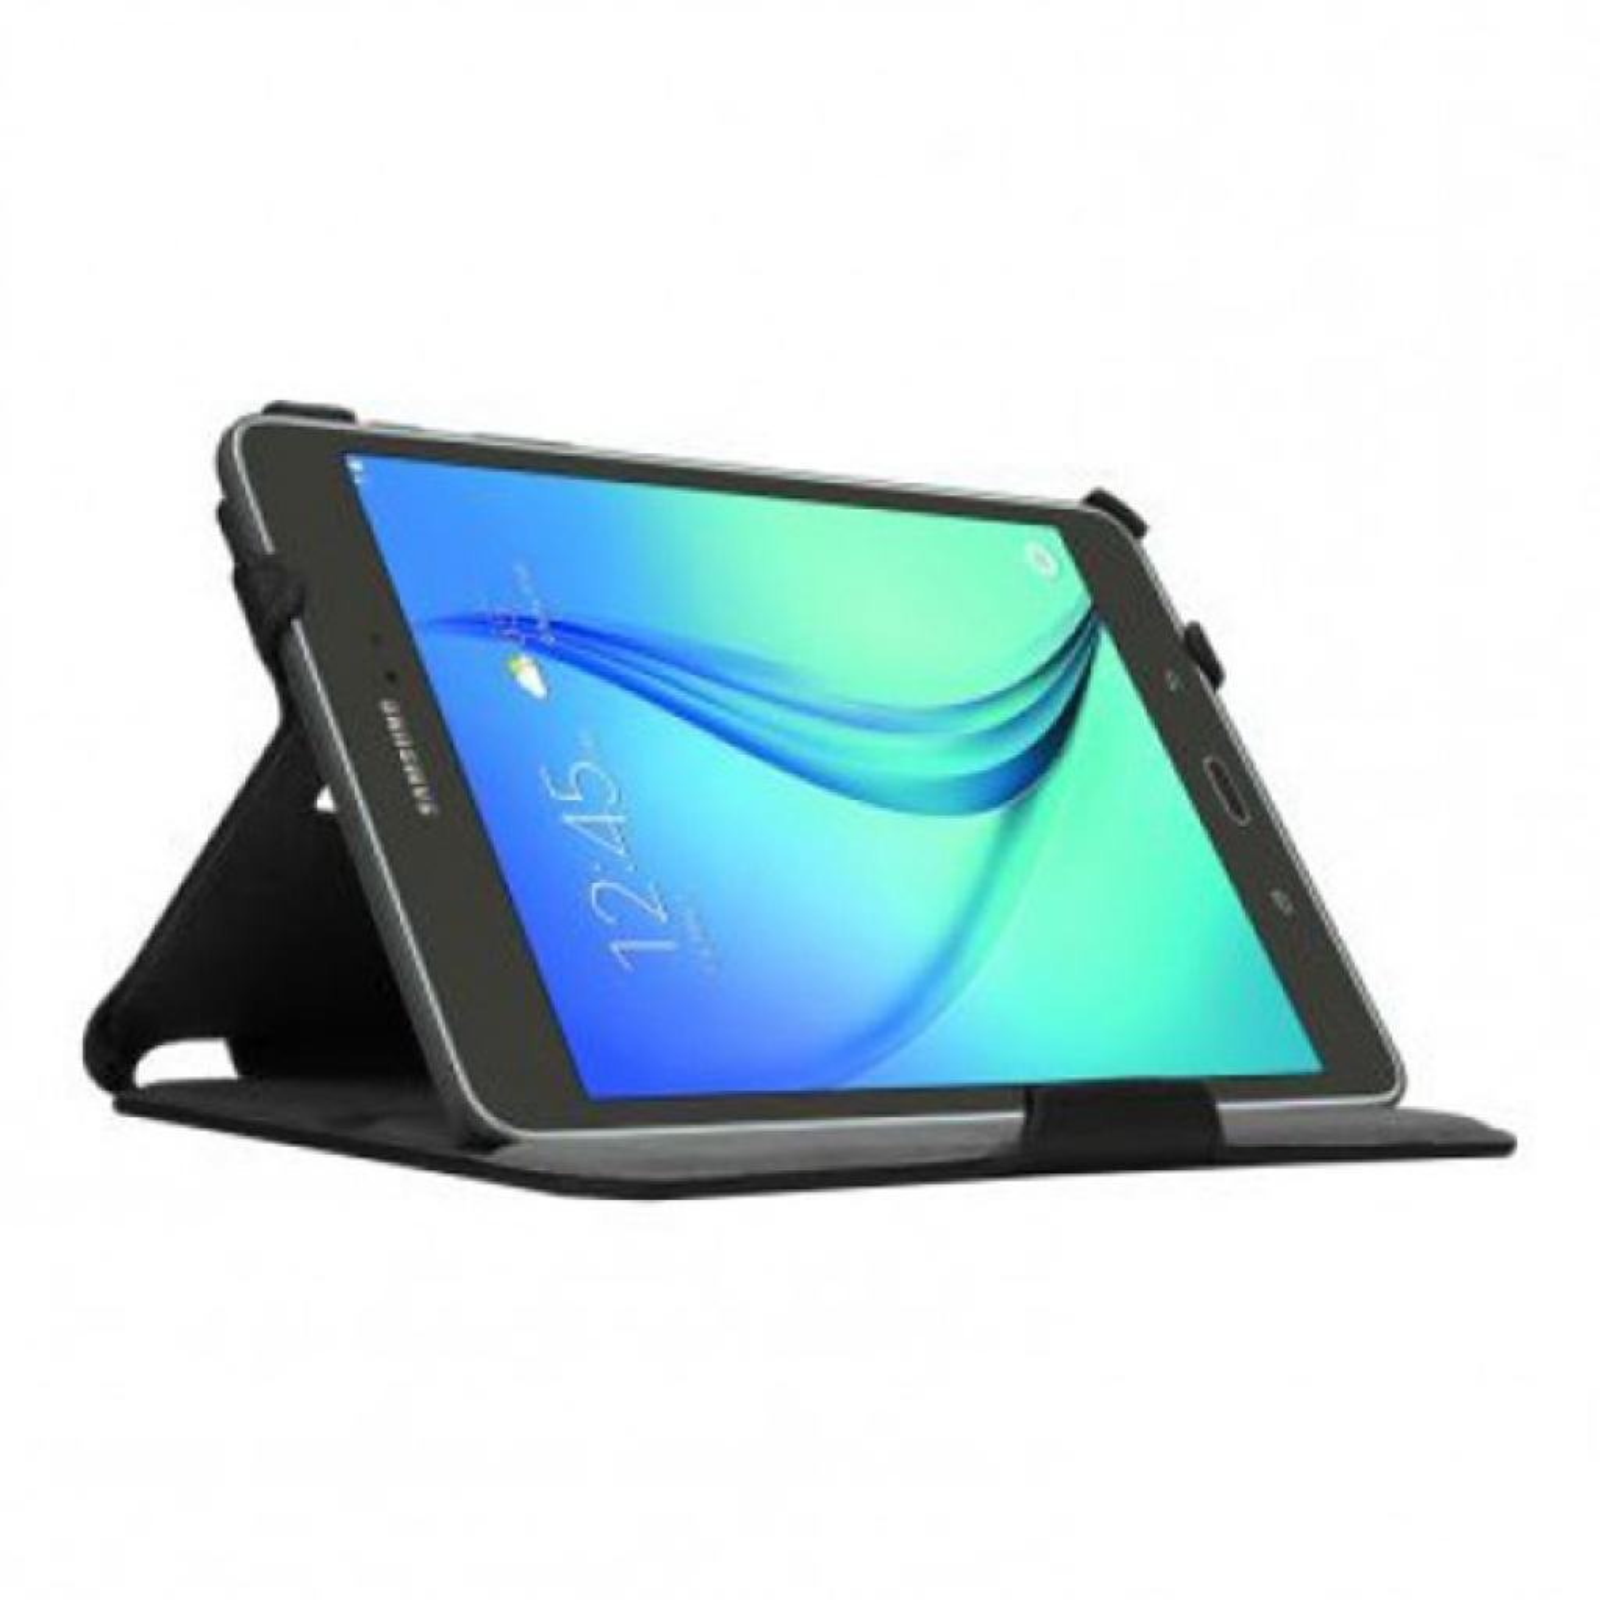 Чехол для планшета AirOn для Samsung Galaxy Tab A 8.0 (4822356754485) изображение 5